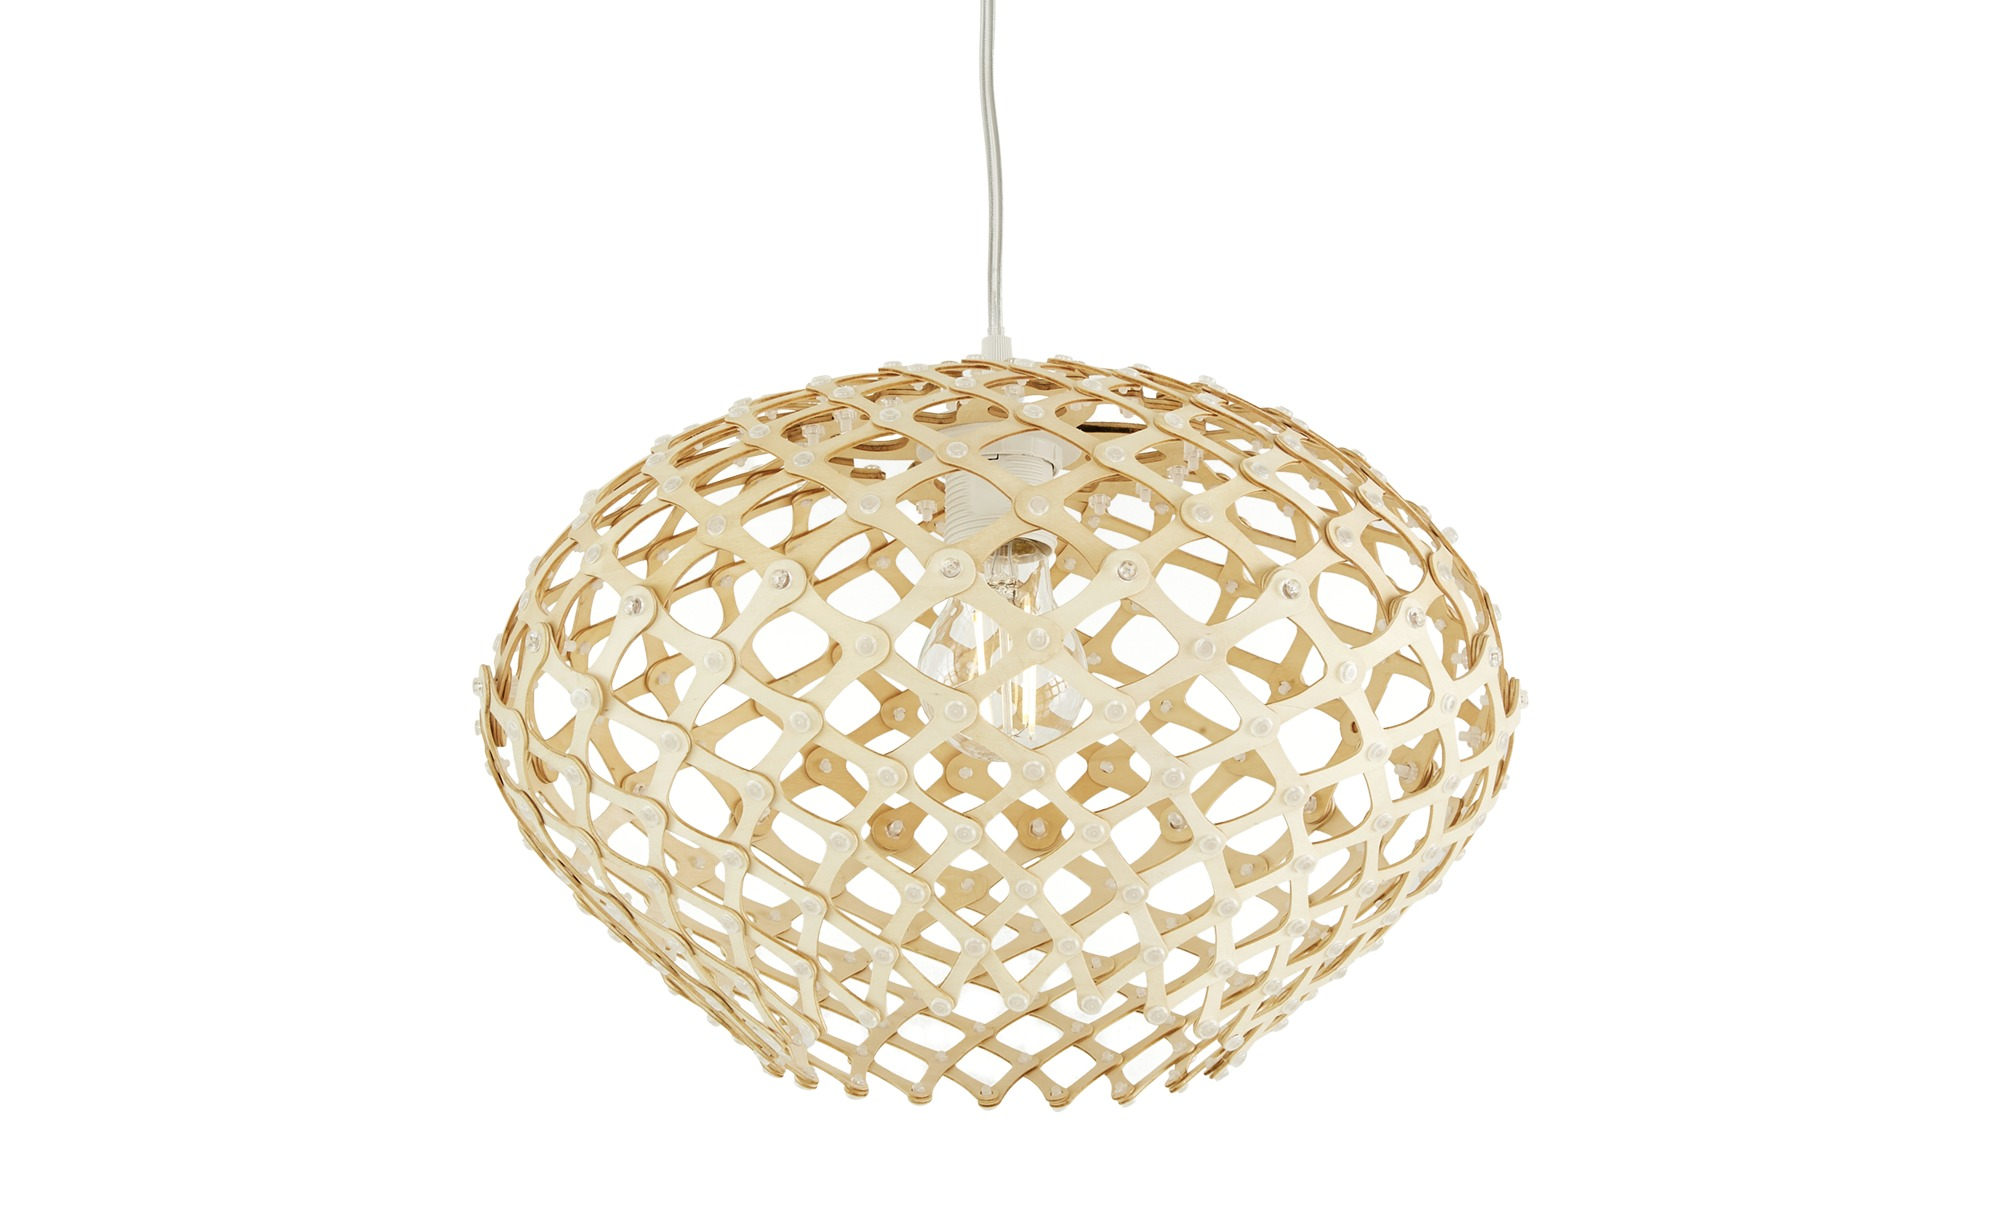 Holz-Pendelleuchte, 1-flammig ¦ braun ¦ Maße (cm): H: 22 Ø: [35.0] Lampen & Leuchten > Innenleuchten > Pendelleuchten - Höffner